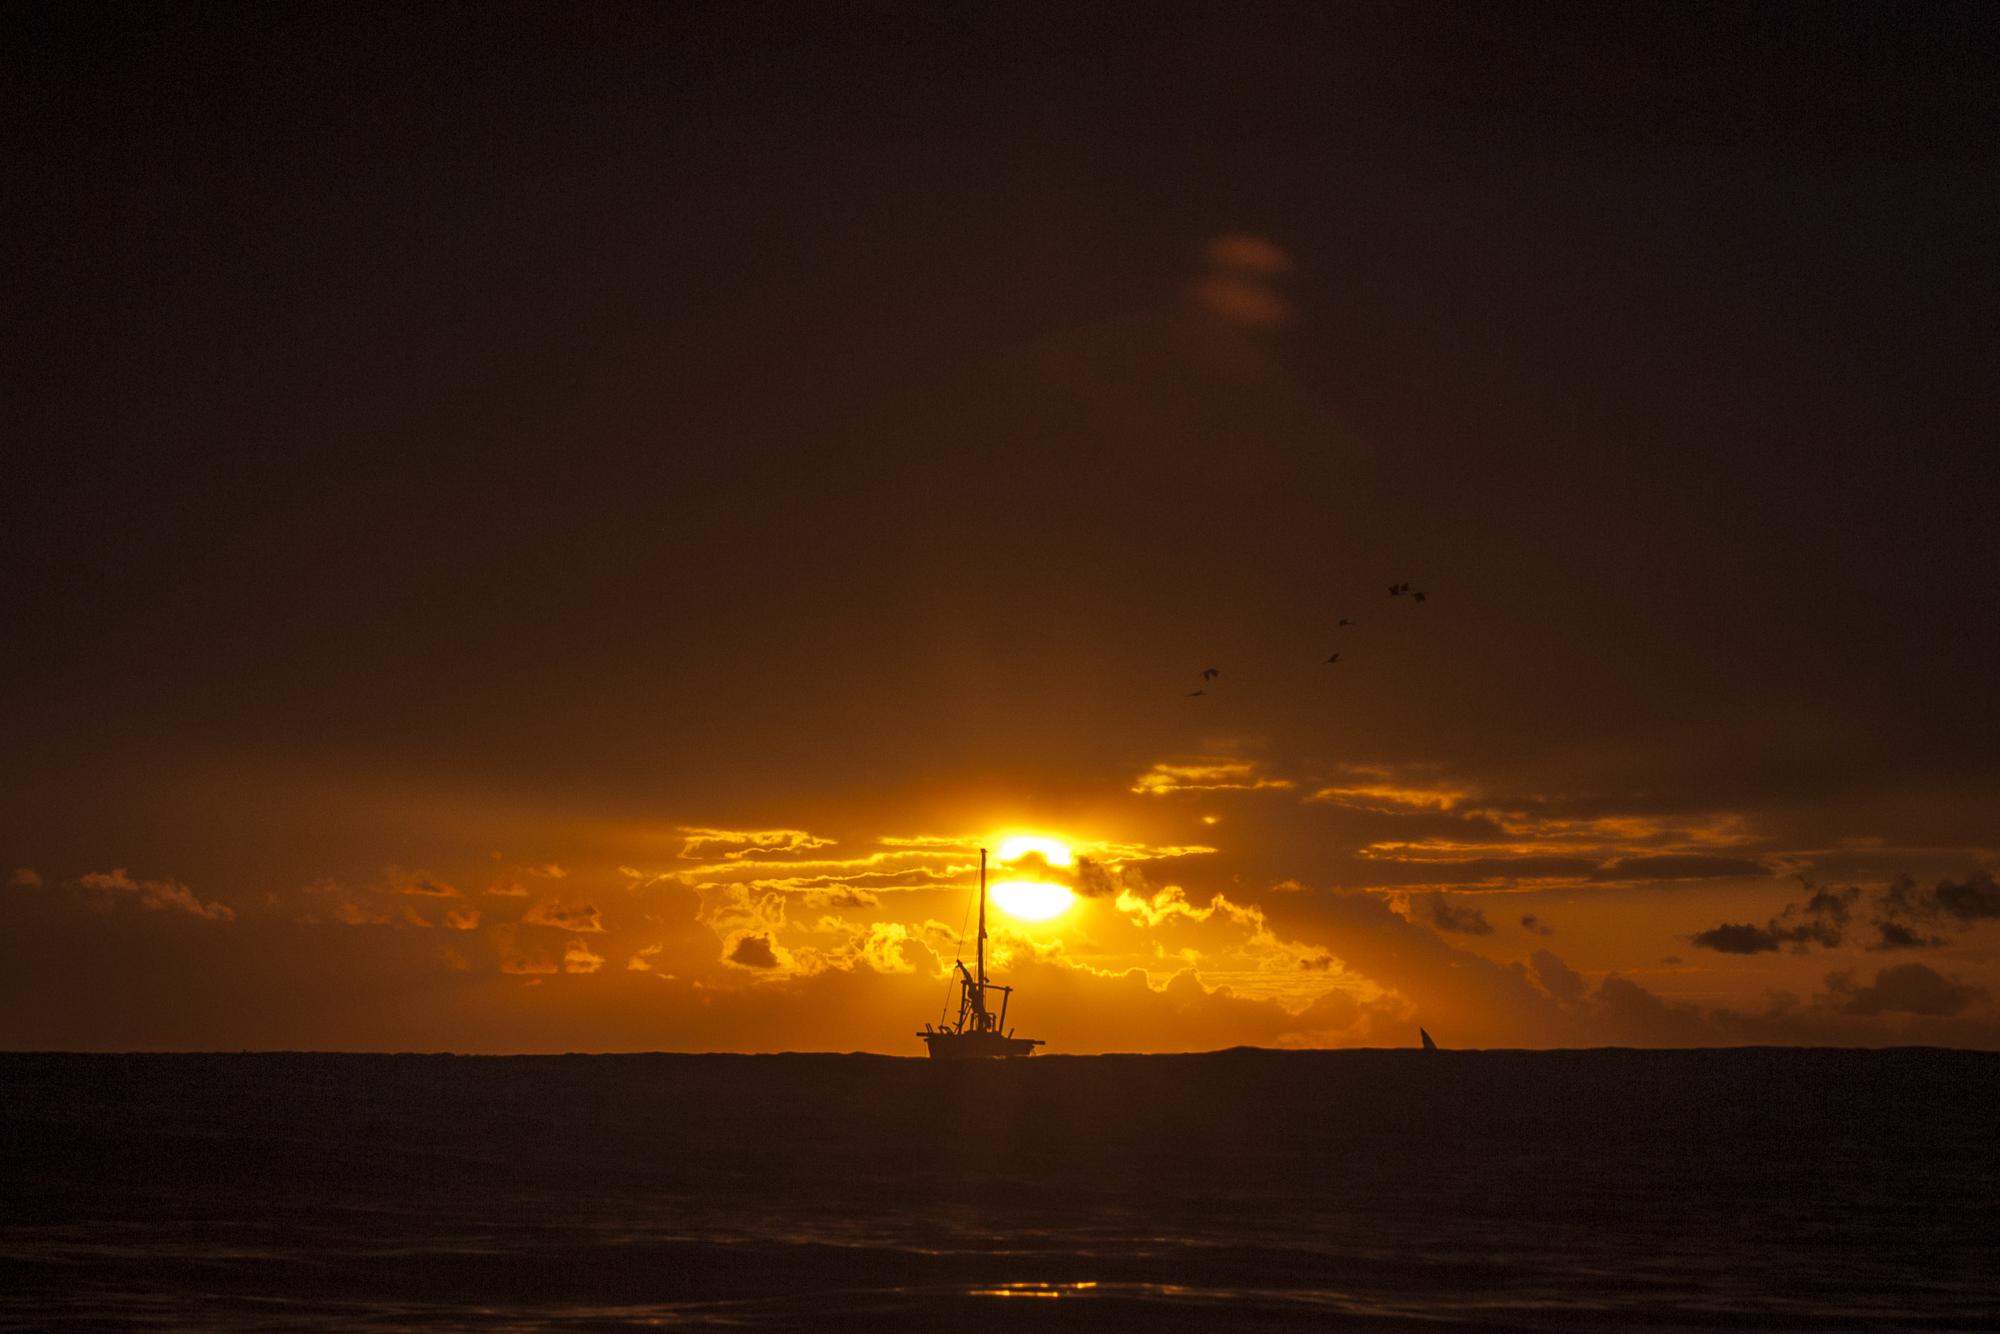 Dhow Sunrise - Dar es Salaam, Tanzania  PHOTOGRAPHY: ALEXANDER J.E. BRADLEY •NIKON D200 • Nikon AF Zoom-Nikkor 35-70mm Ƒ/2.8D @ 70MM • Ƒ/11 • 1/500 •ISO 100